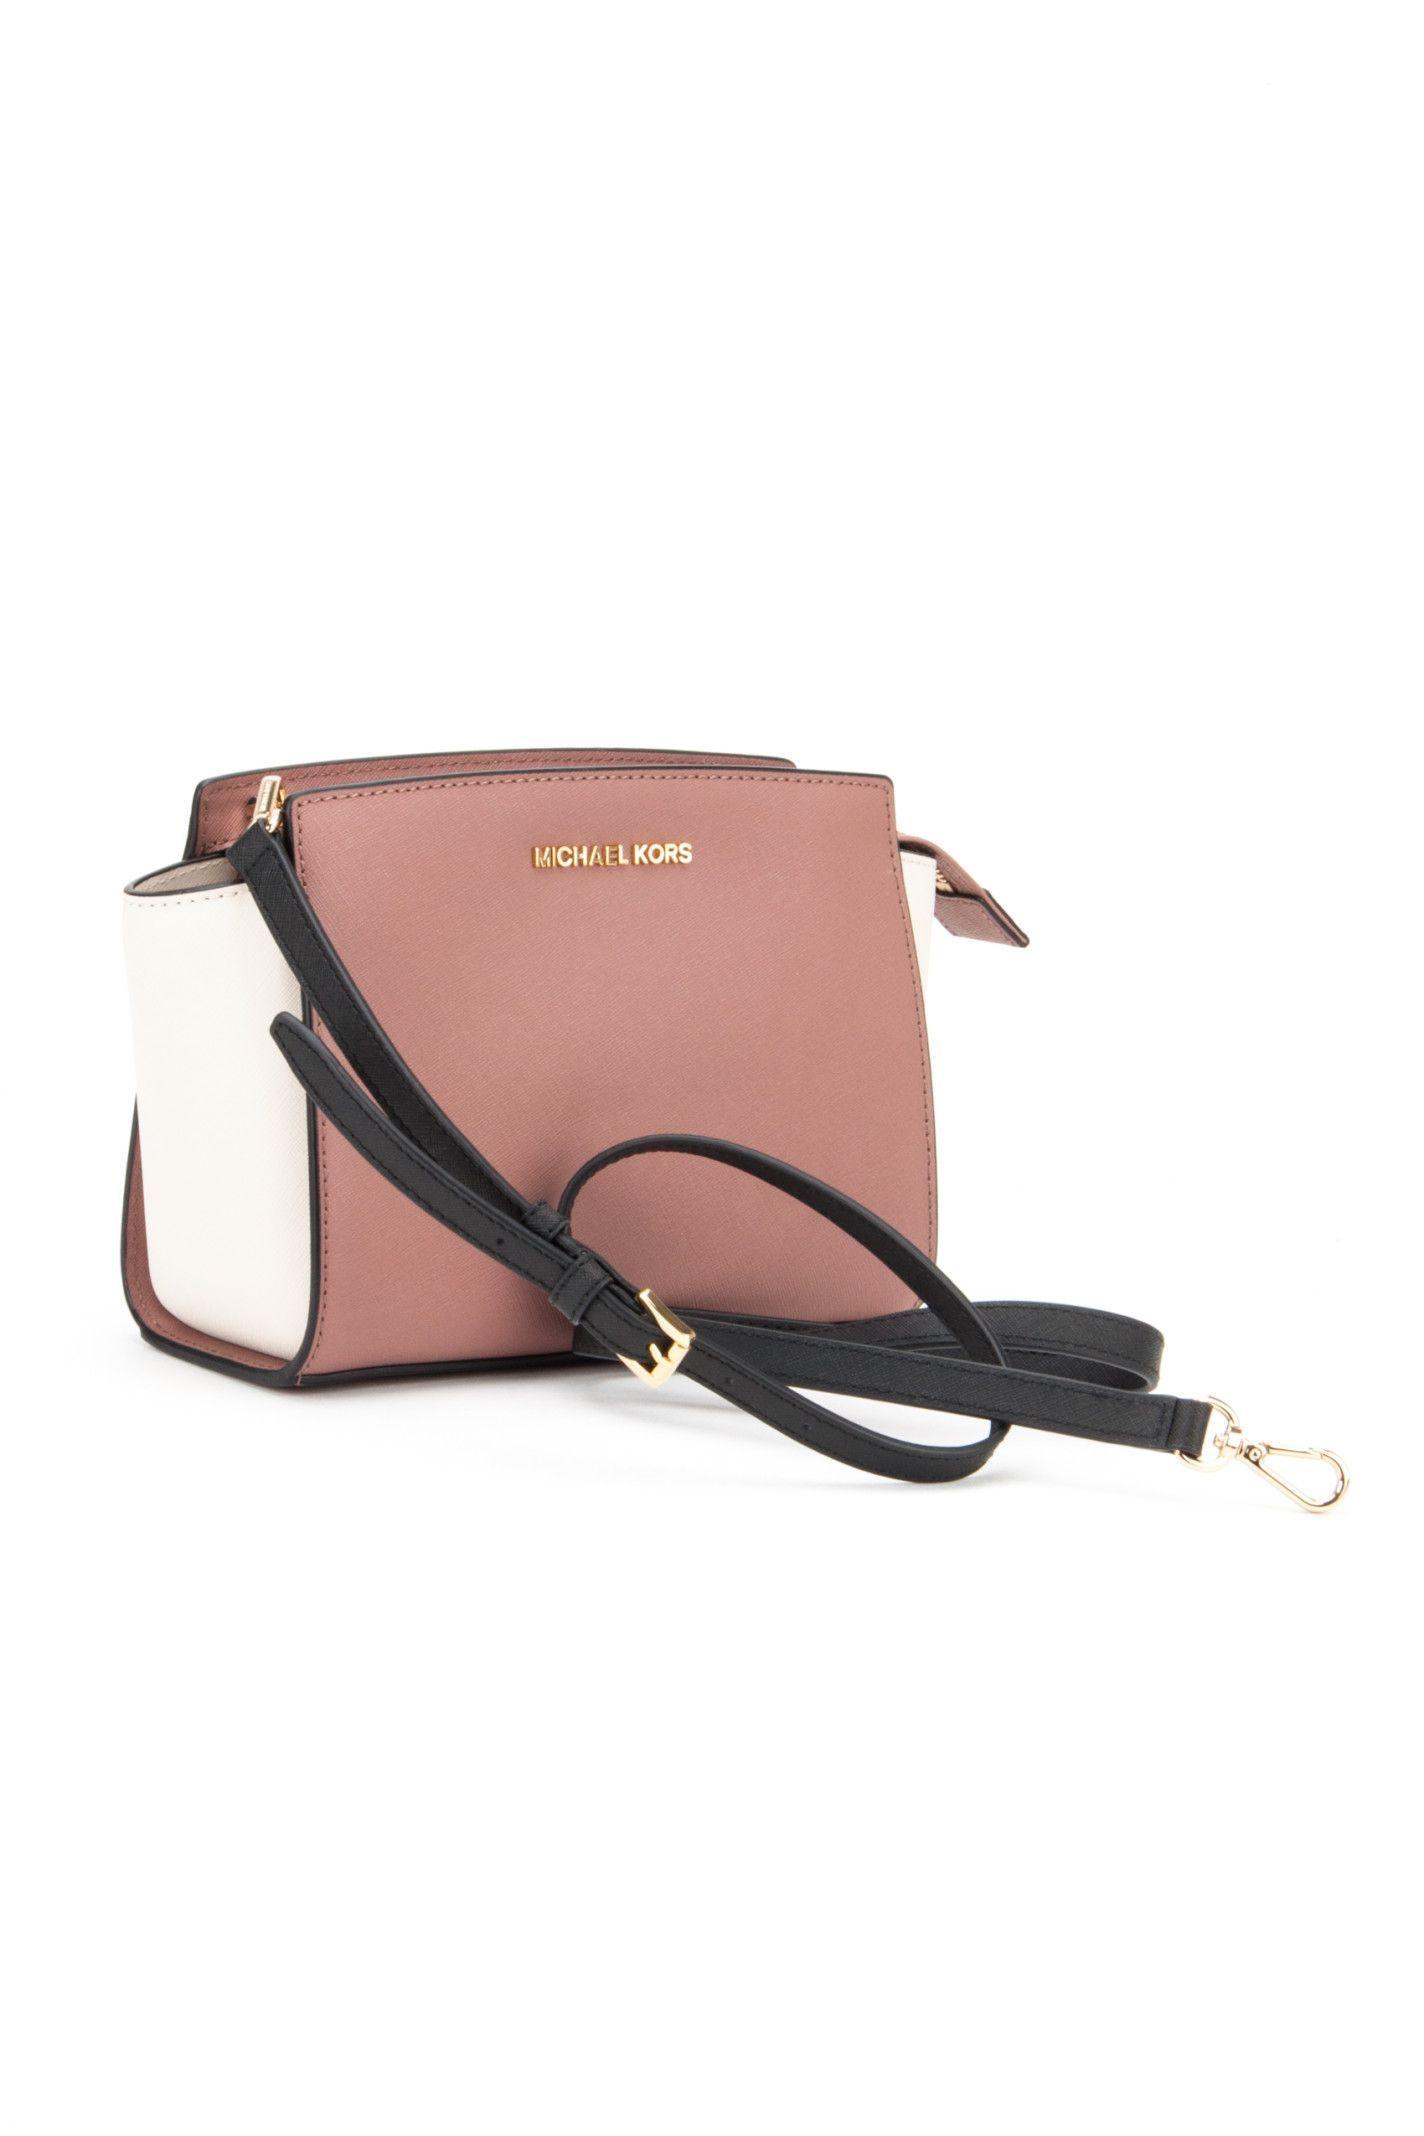 8650fc66f3e4 MICHAEL Michael Kors SELMA MESSENGER BAG - Talent Womens Handbags Wallets -  amzn.to/